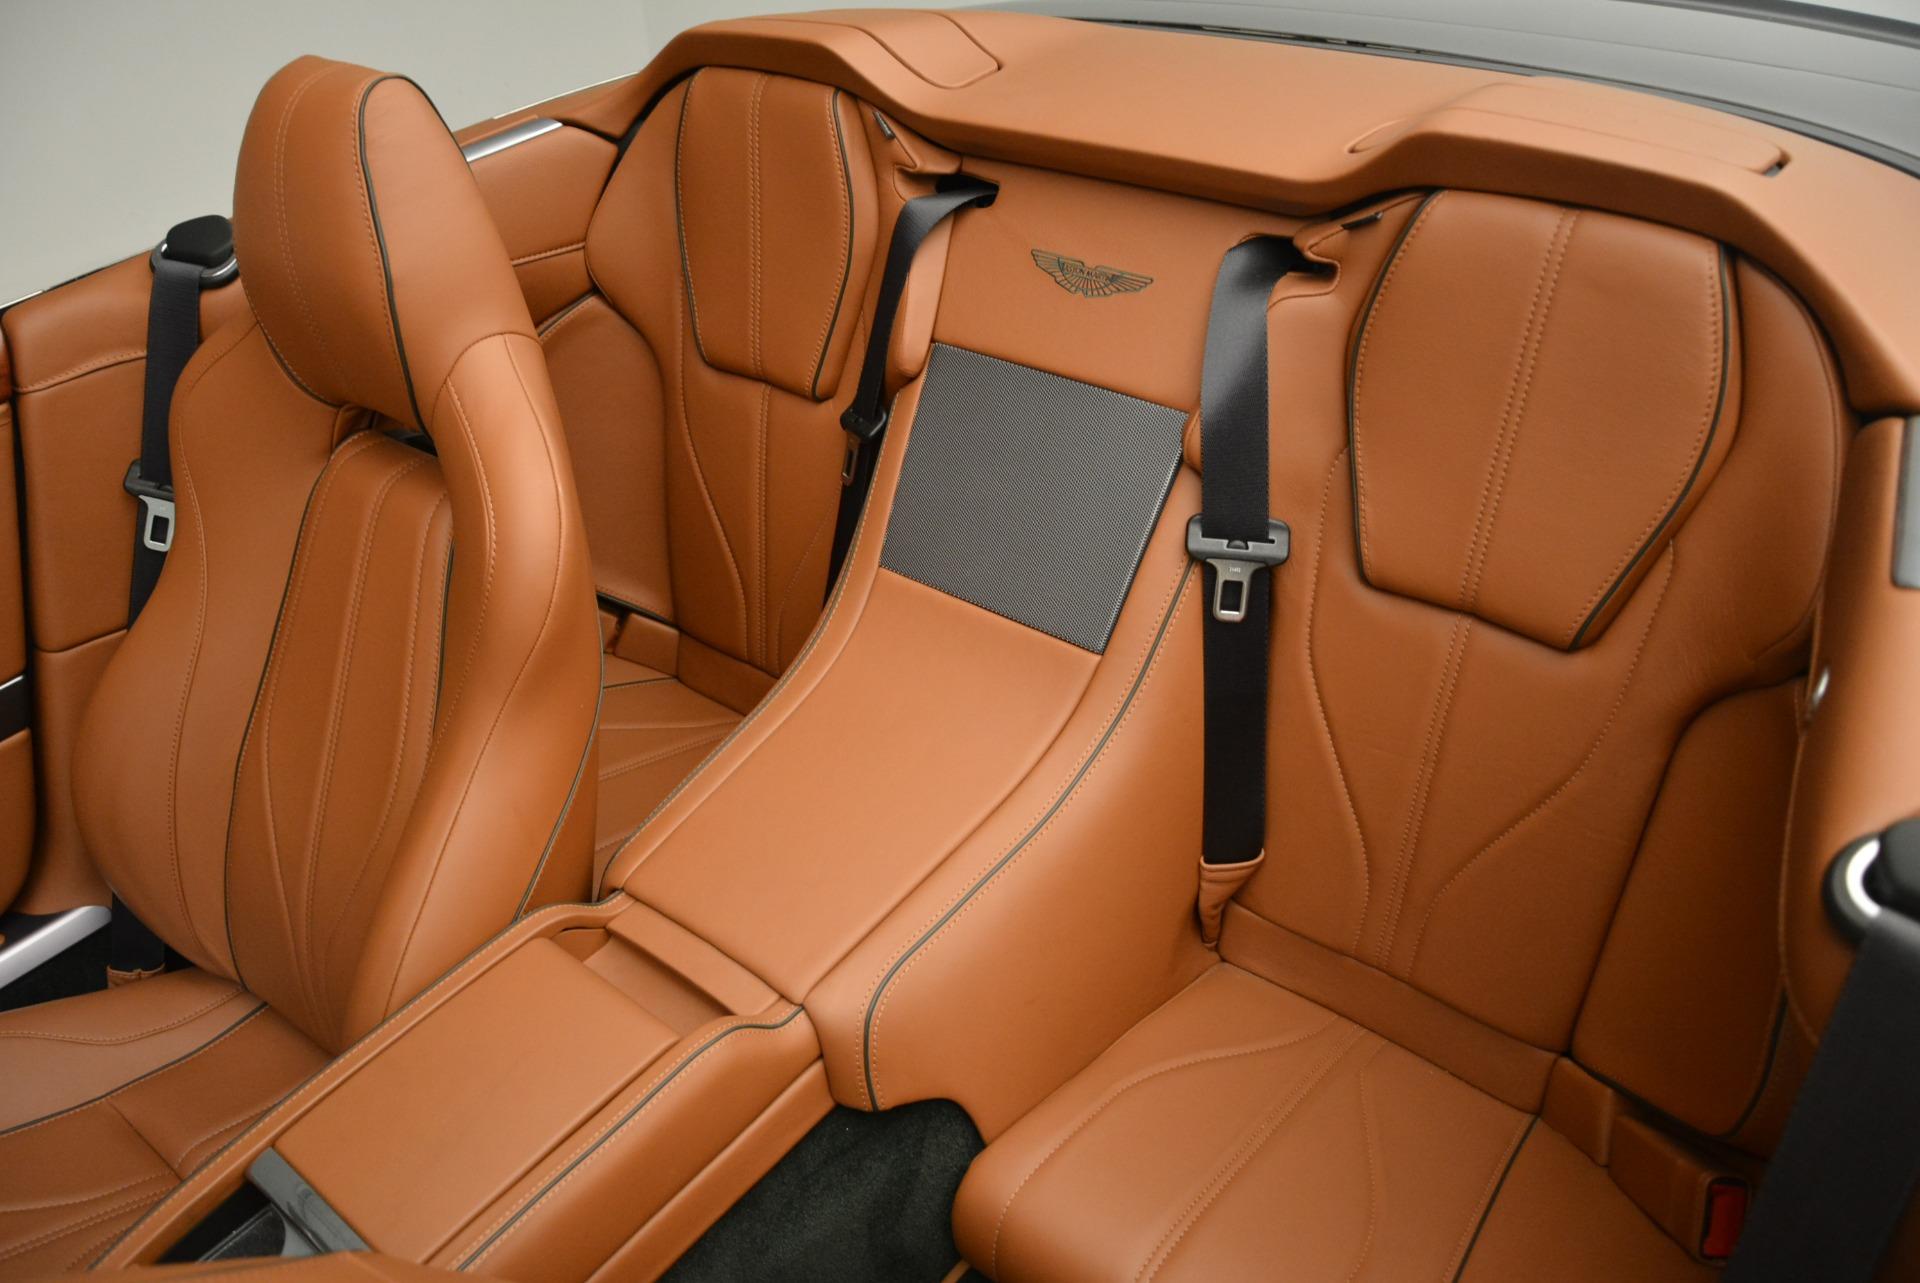 Used 2012 Aston Martin Virage Volante For Sale In Westport, CT 2508_p22